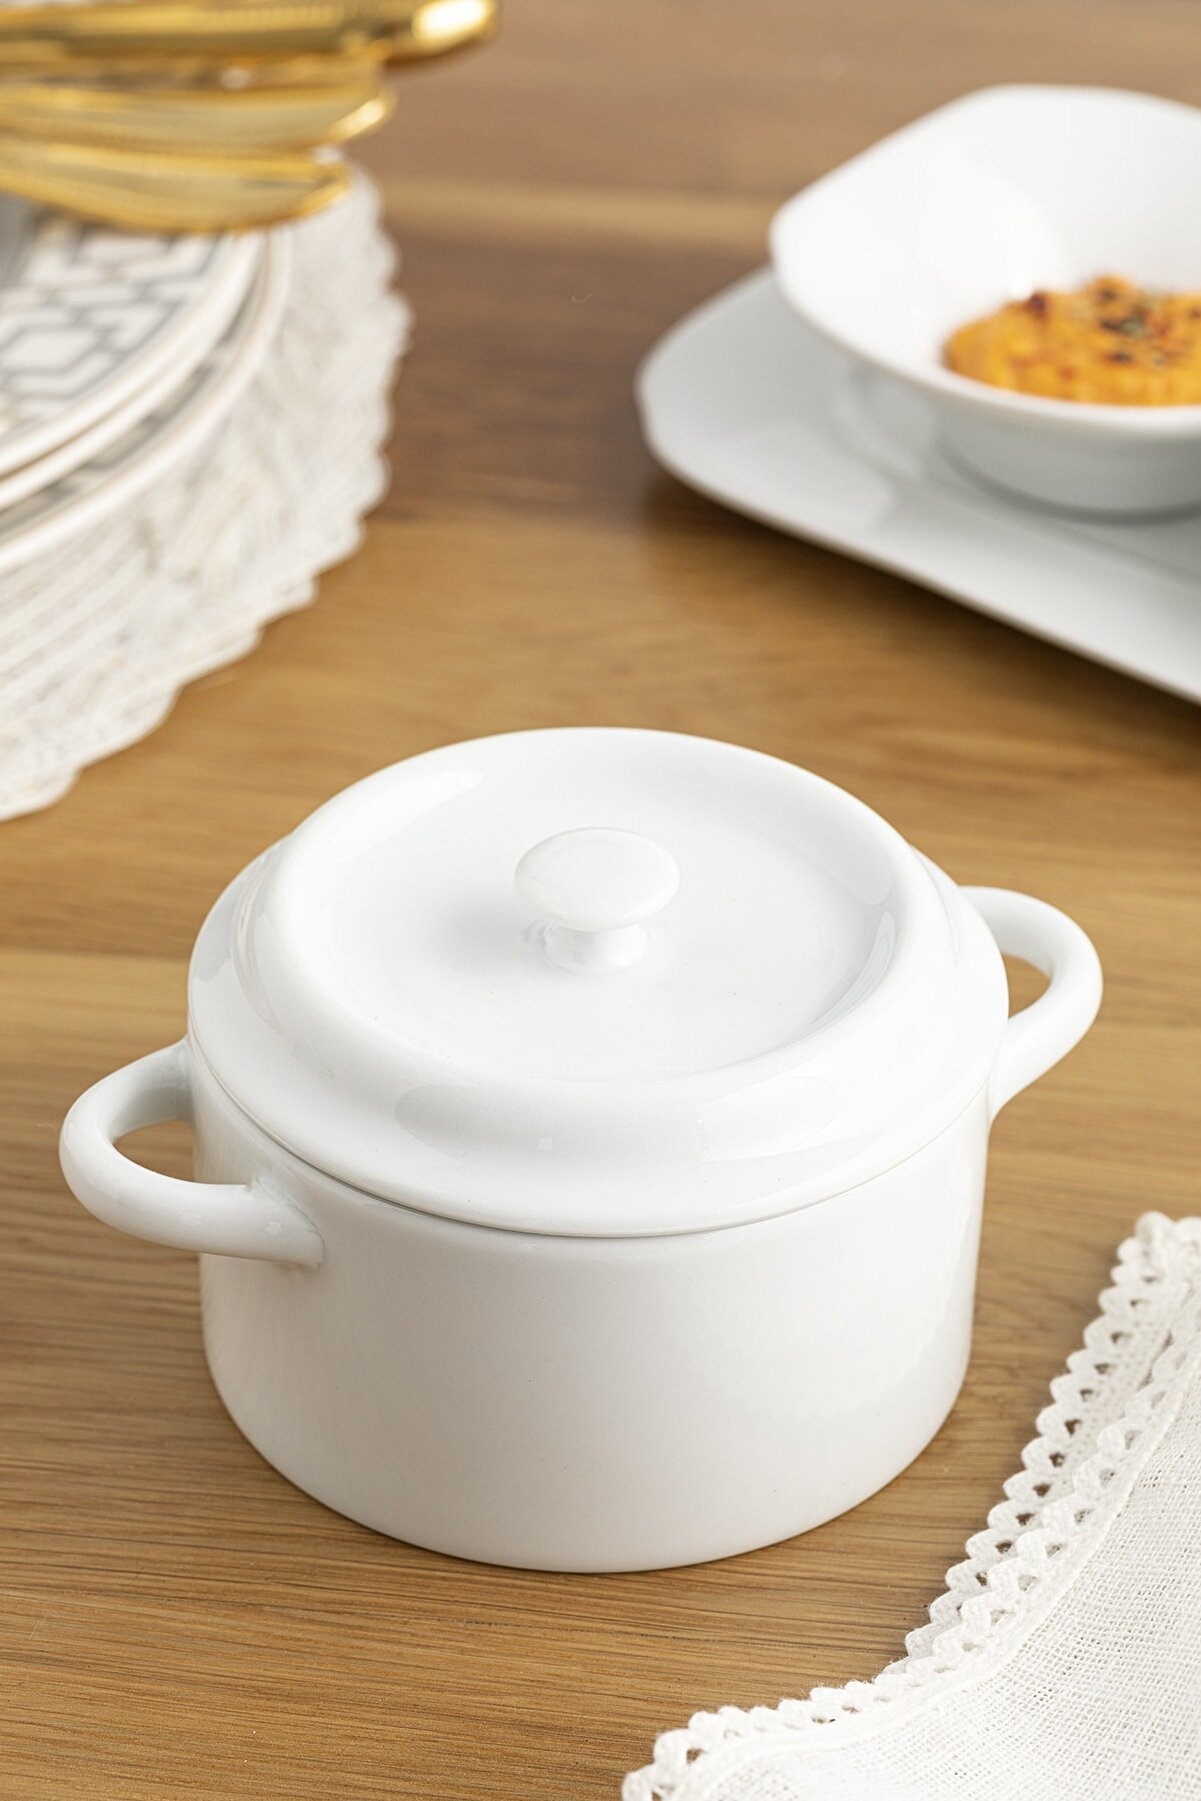 English Home Classy Porselen Tencere 325 Ml Beyaz